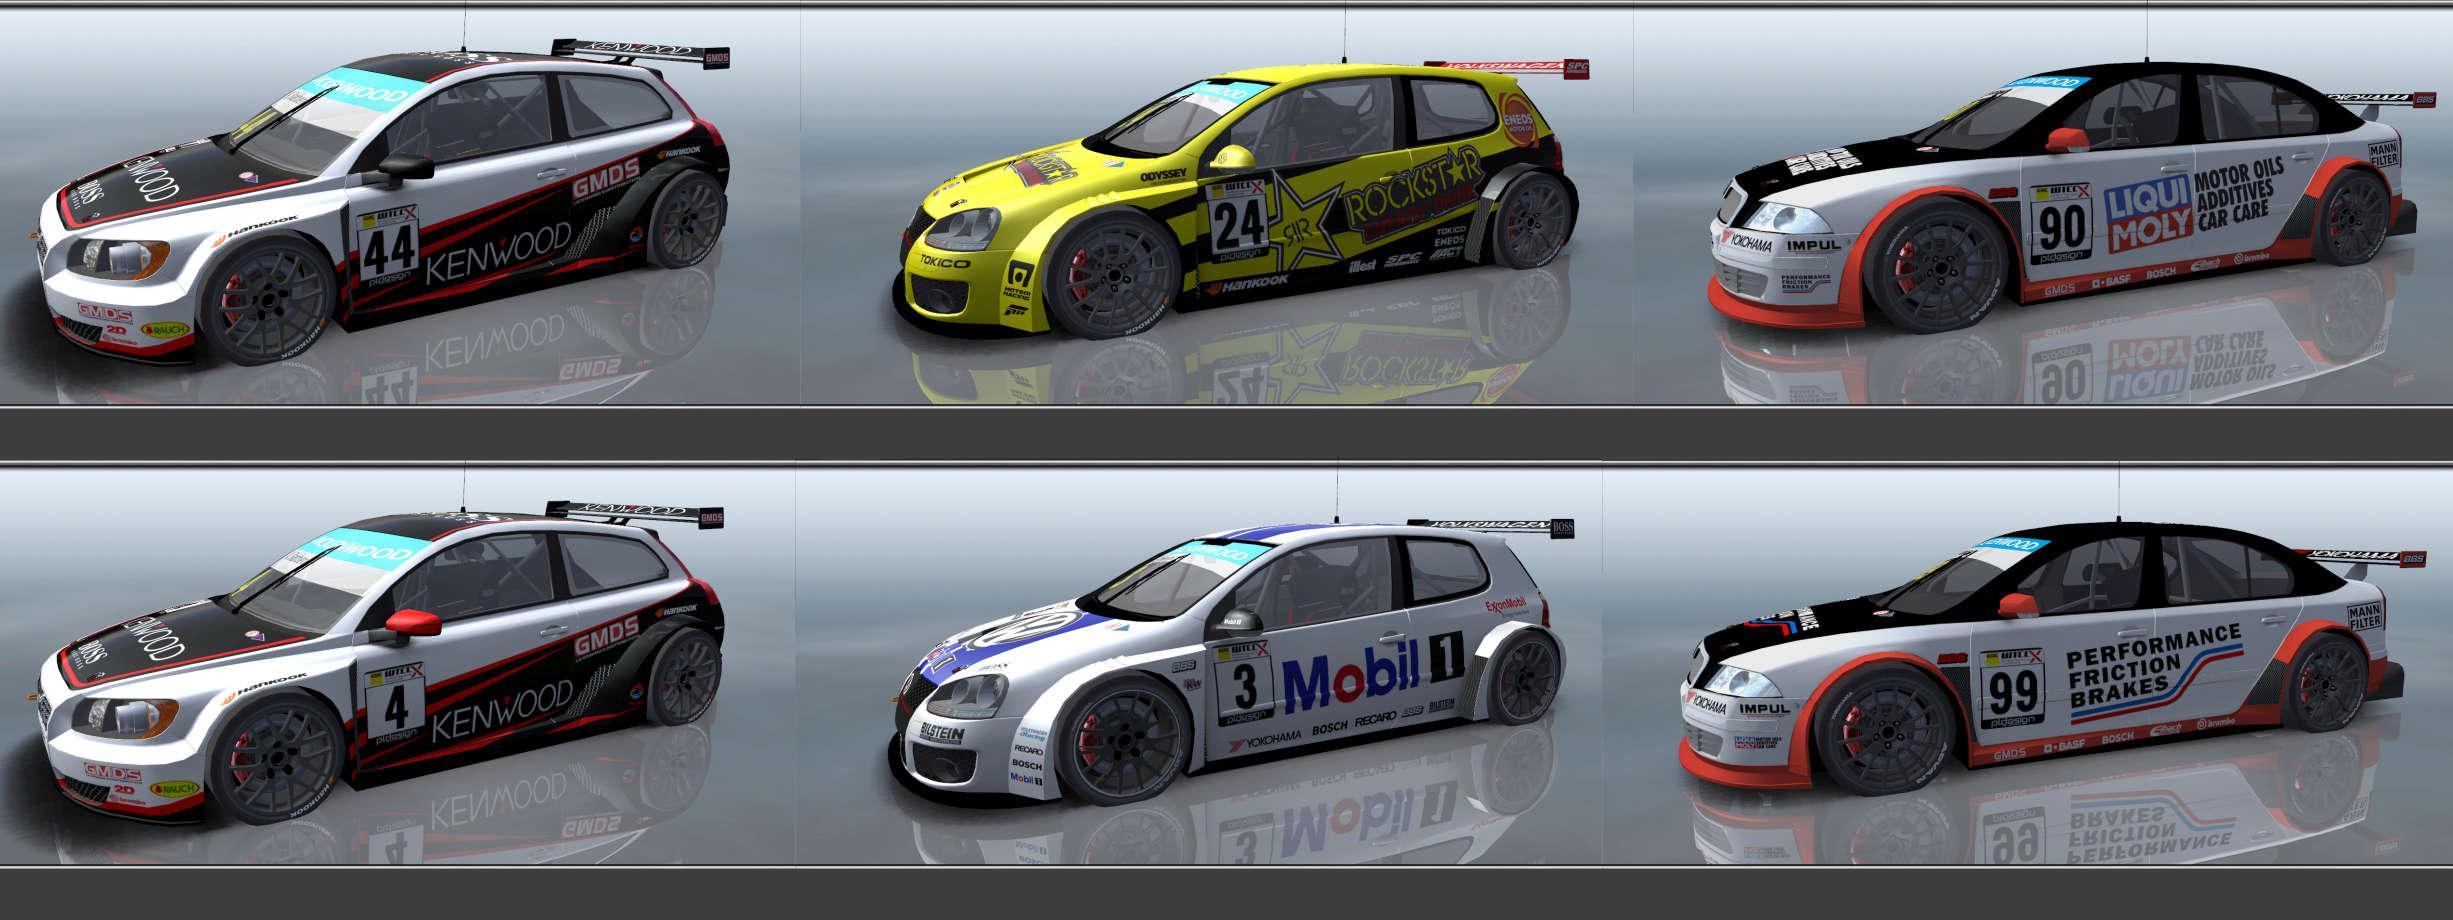 WTCCX Mod cars Wtcc_s10